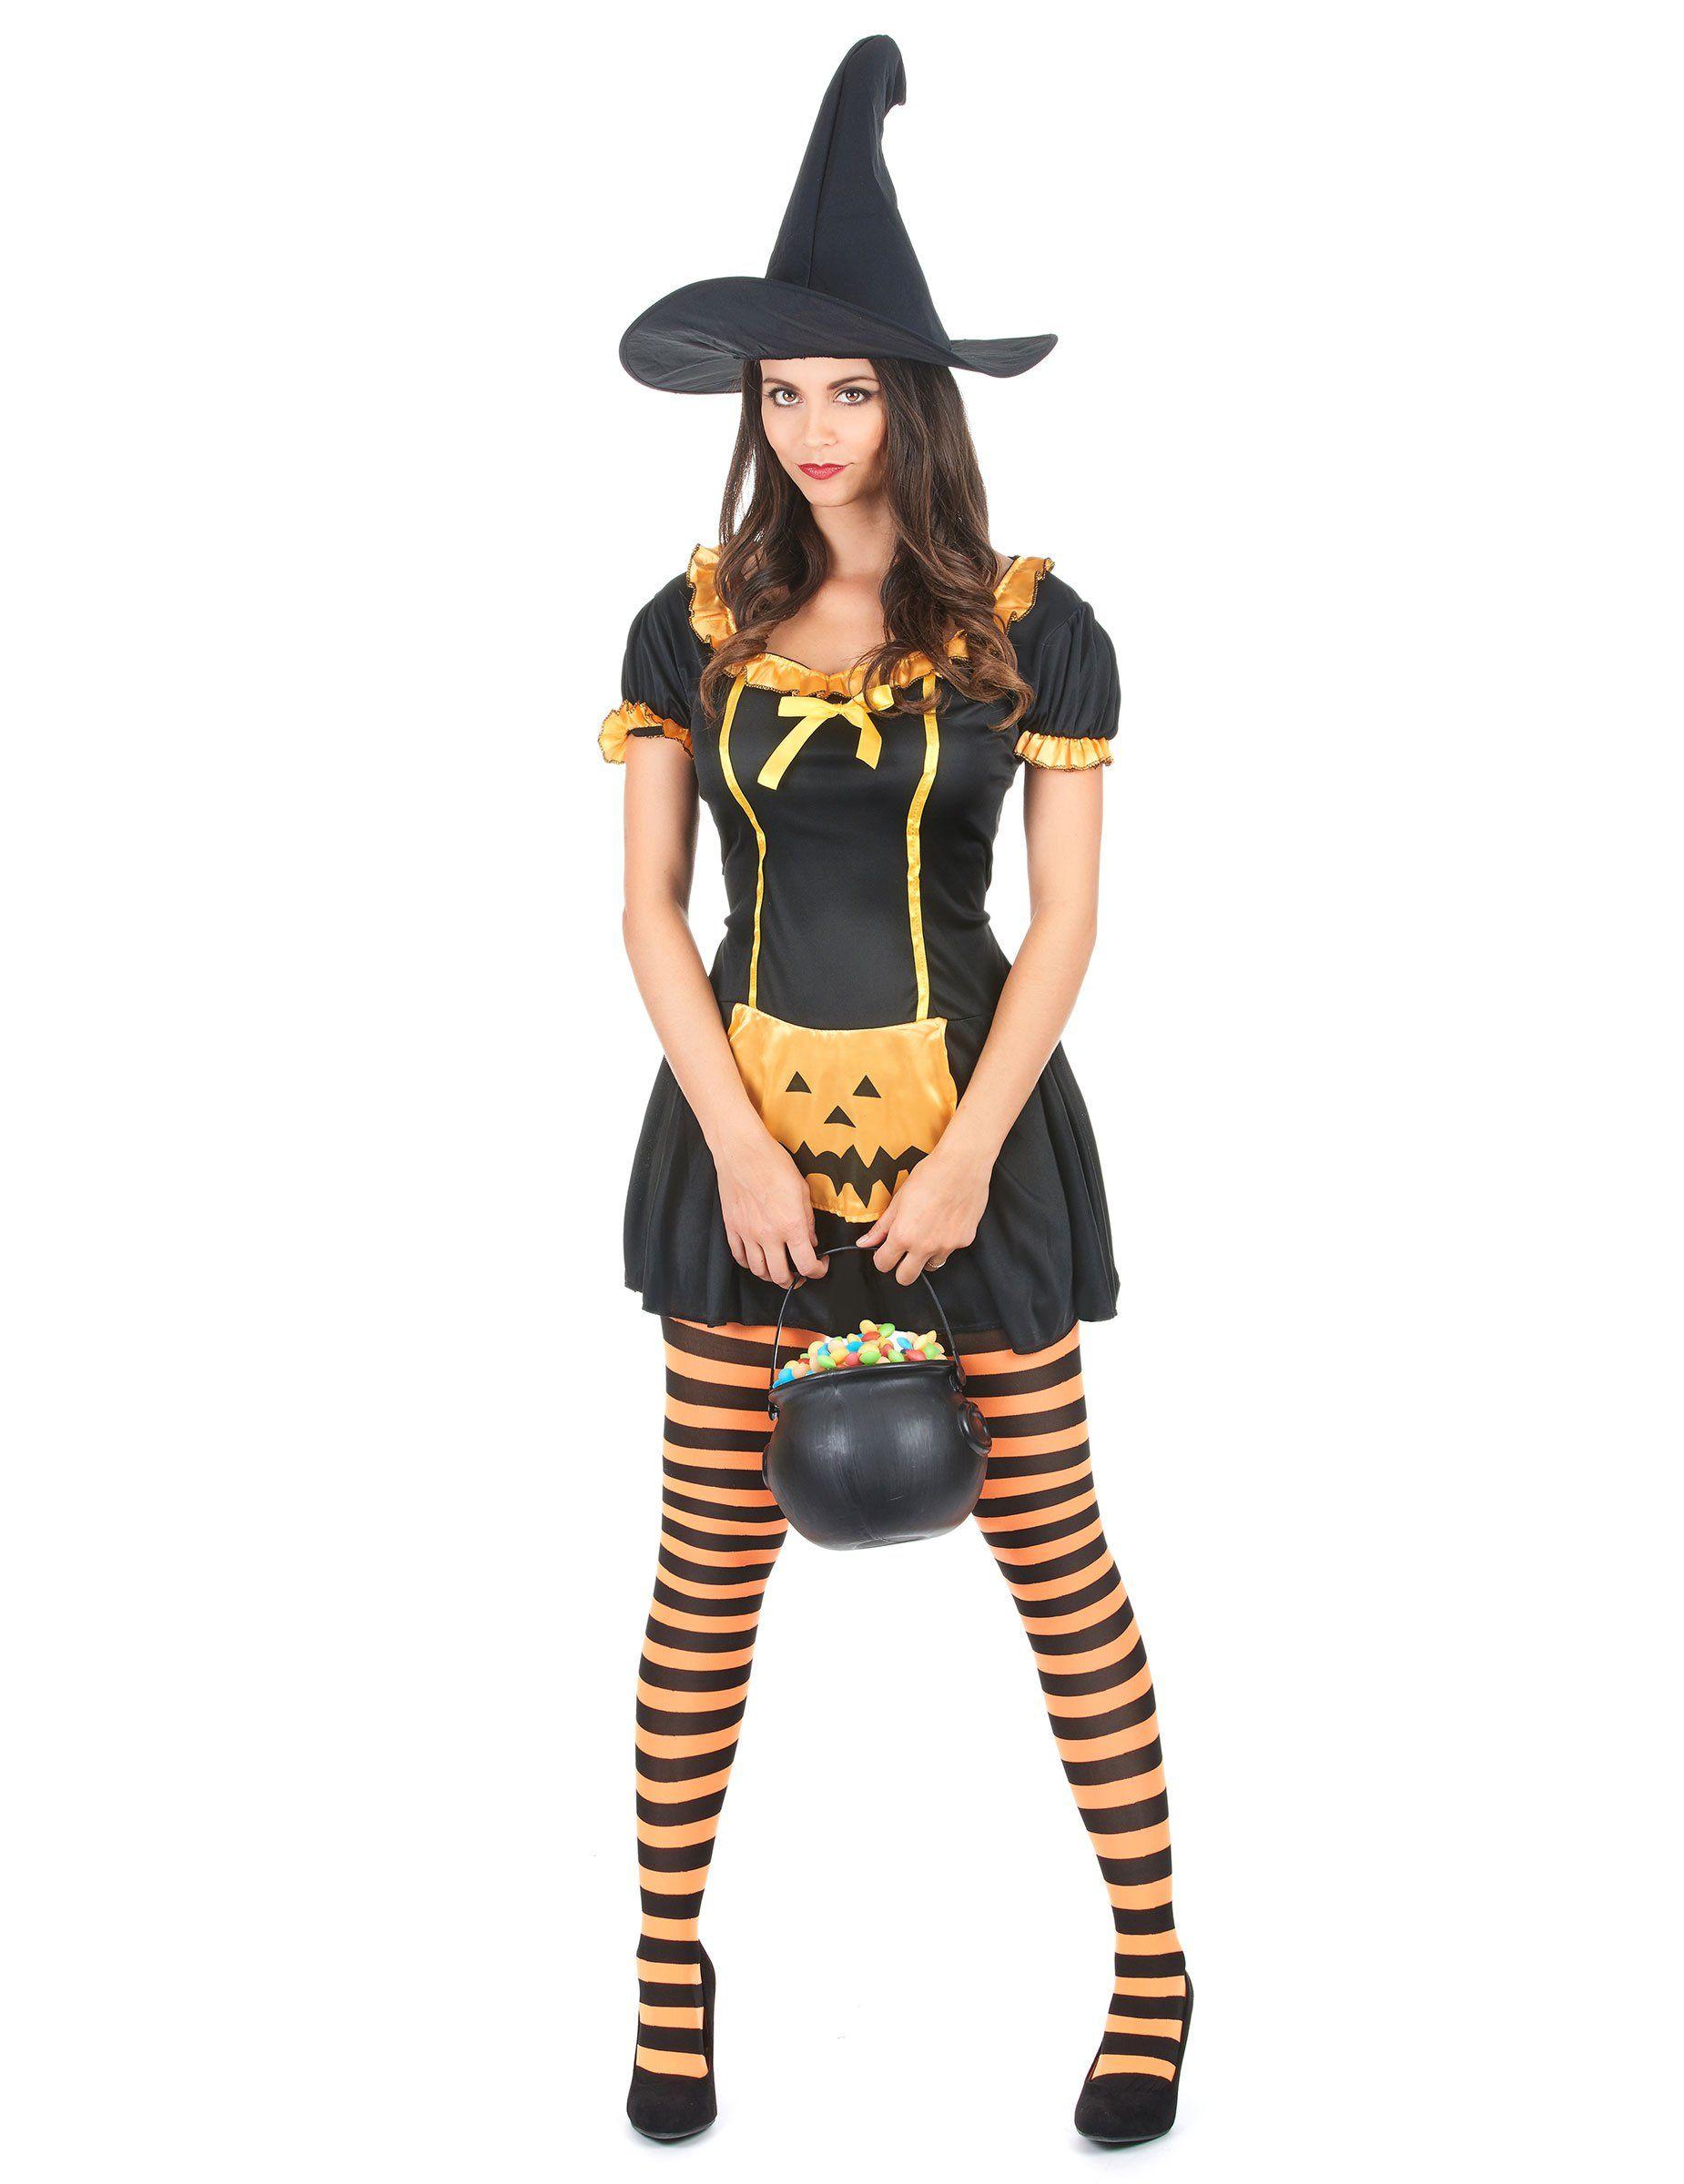 3c10a5562001 Disfraz de bruja calabaza para mujer ideal para Halloween